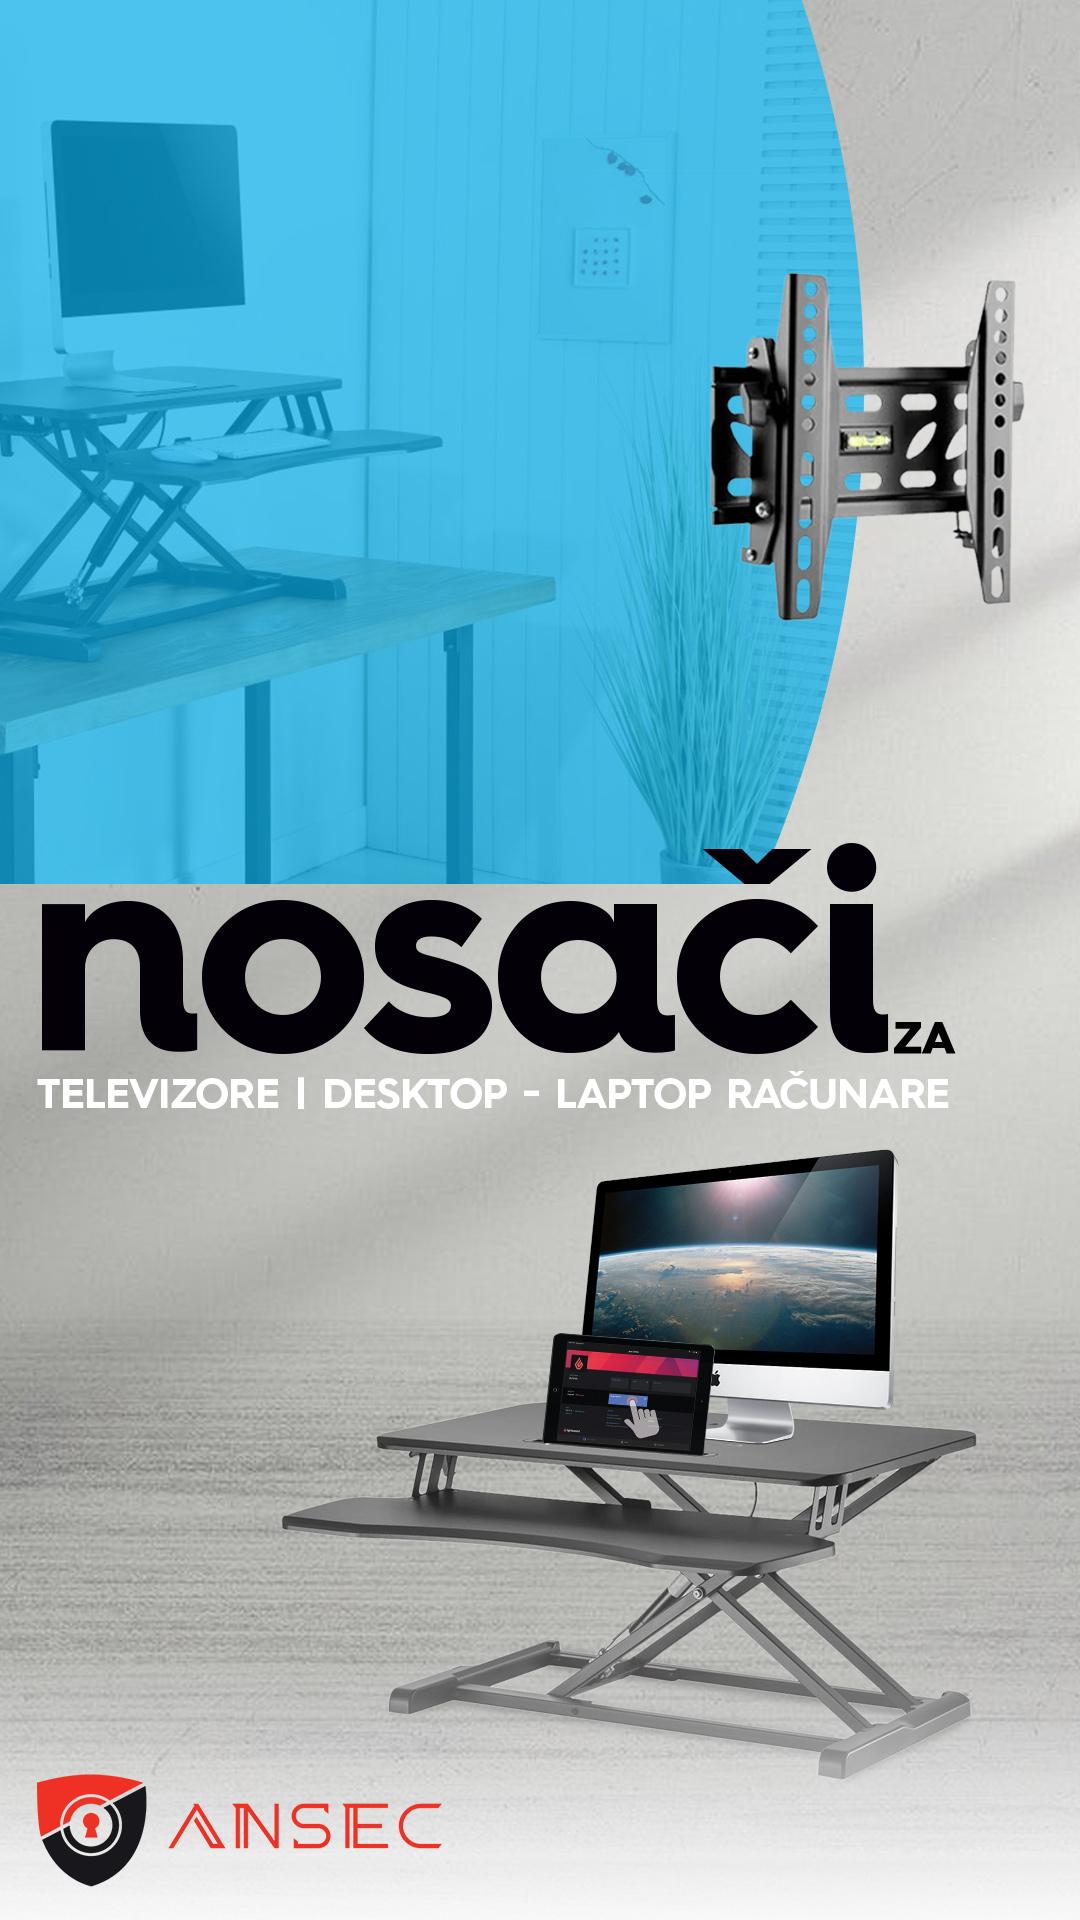 TV nosaci i nosaci za laptop